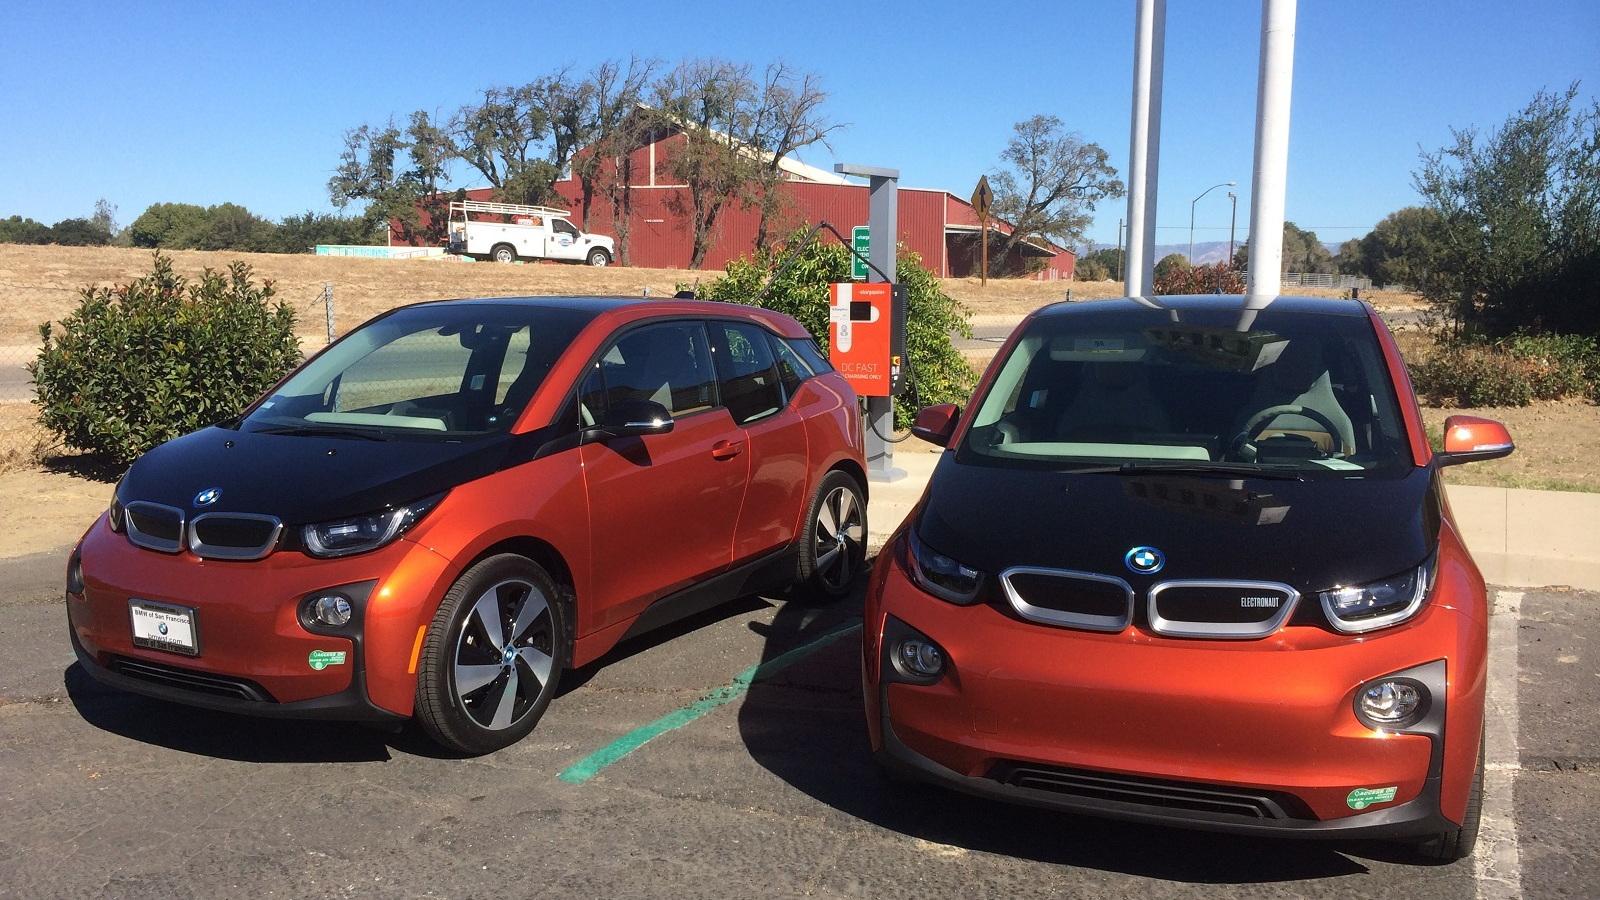 2015 BMW i3 REx fast-charging at Keefer's, King City, California  [photo: Jeff Pantukhoff]